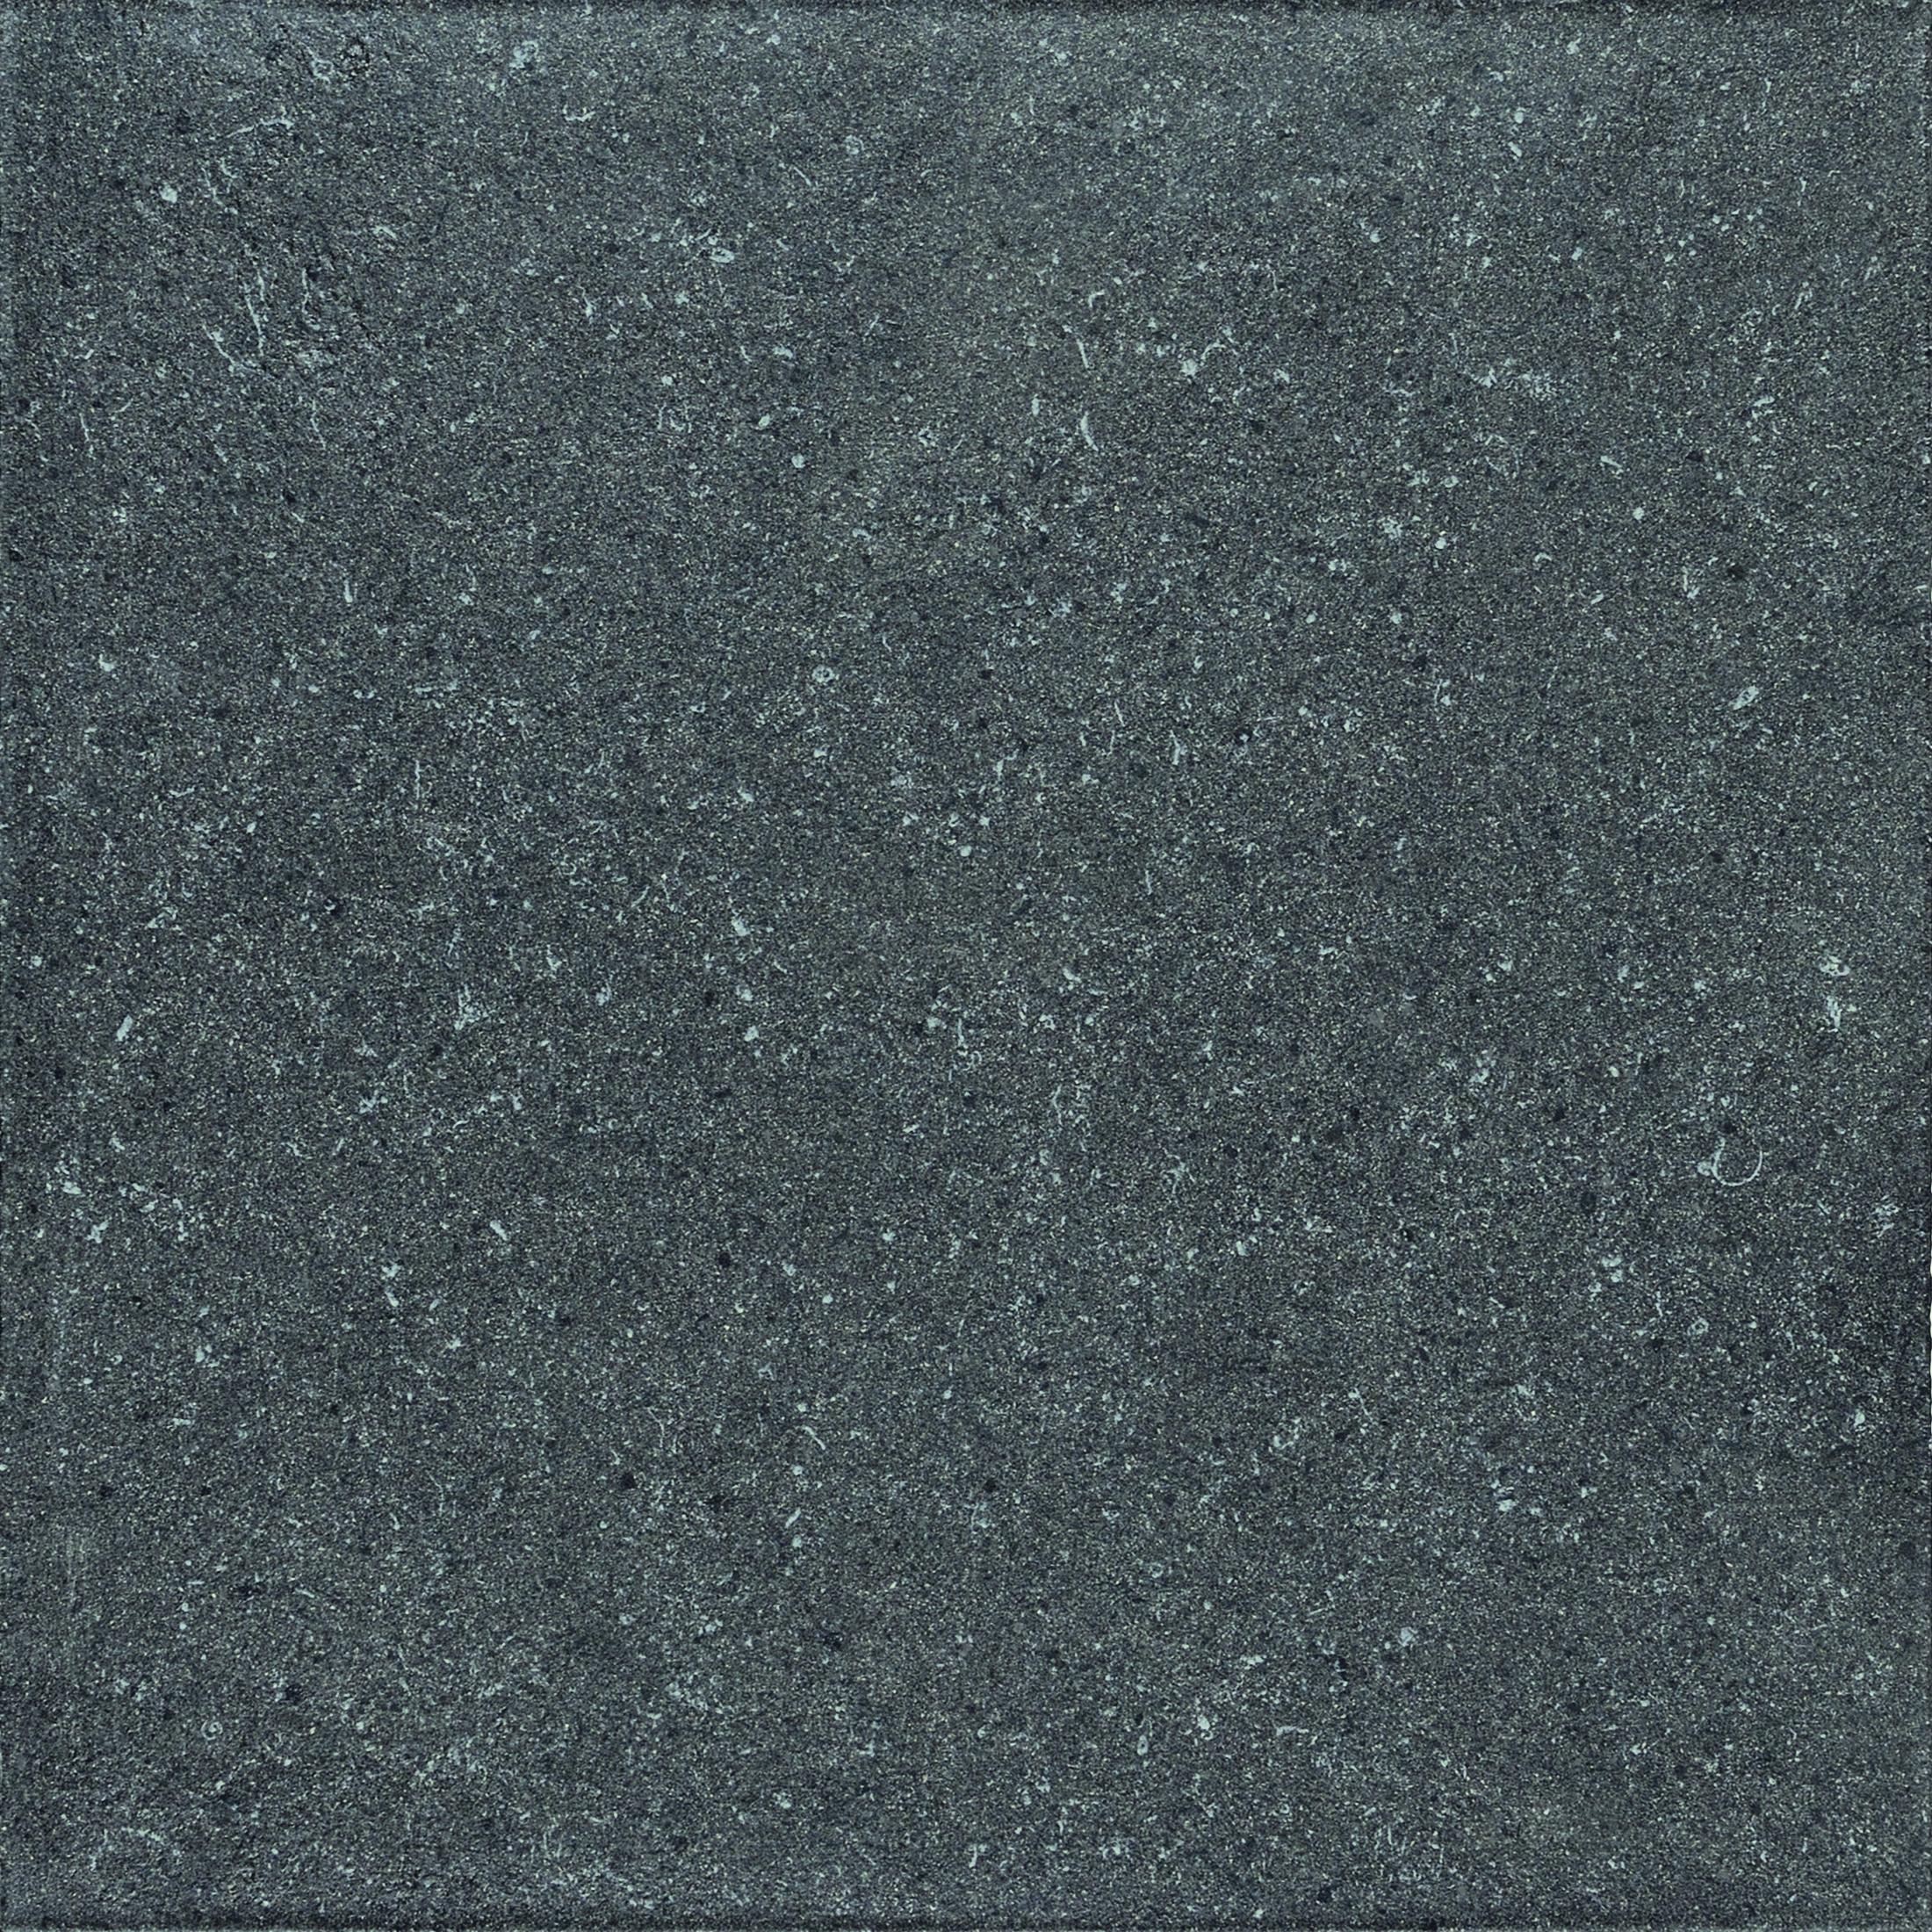 V1305/1306 Skyport Black